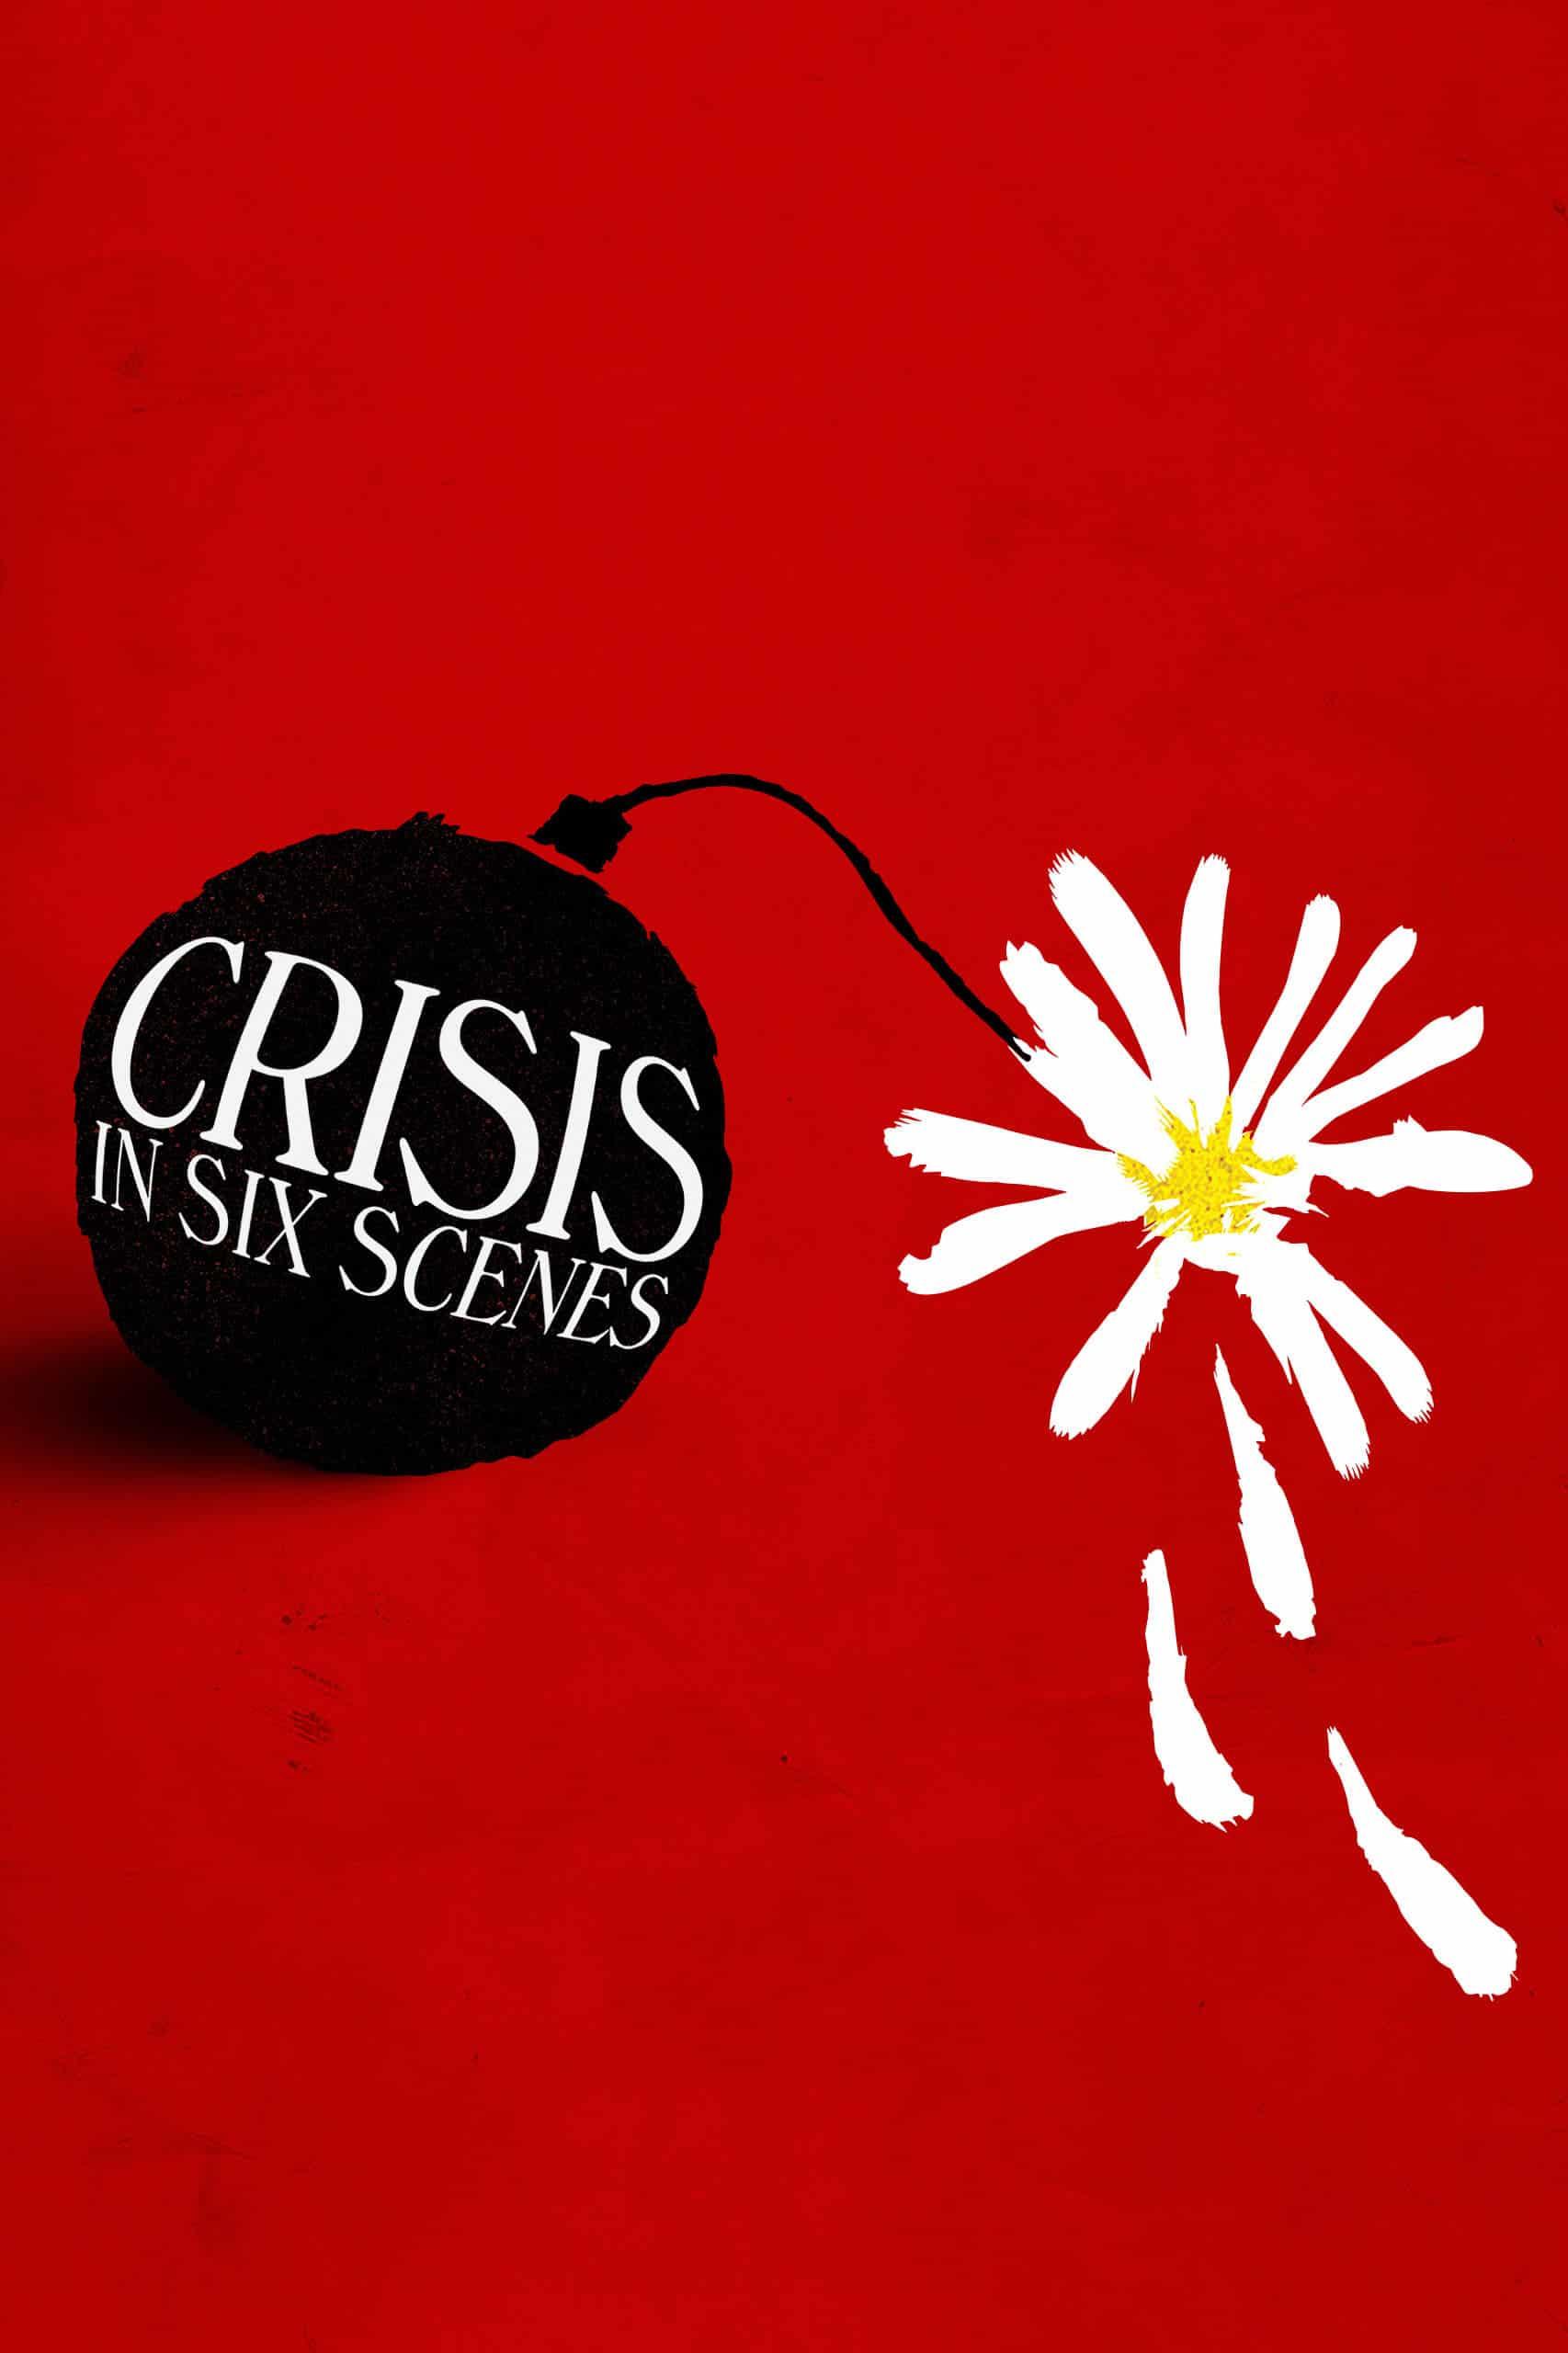 Crisis in Six Scenes, 2016